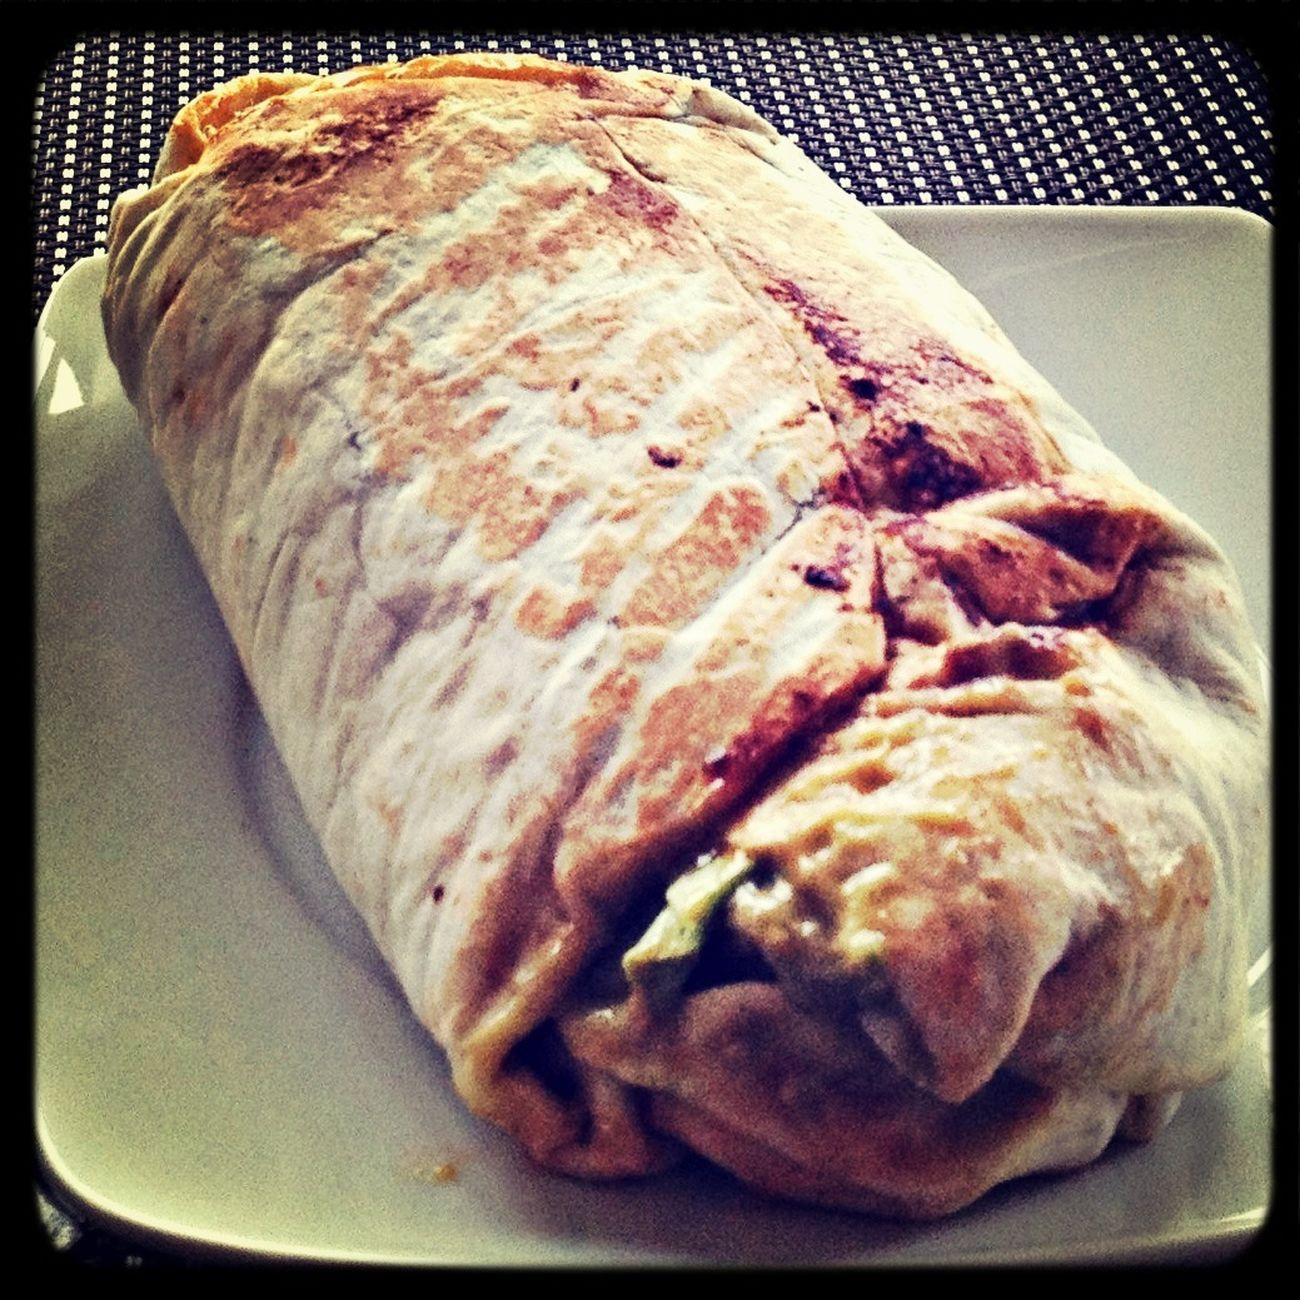 Massive Burritos Lunch Break Wrap It Up Stuffed